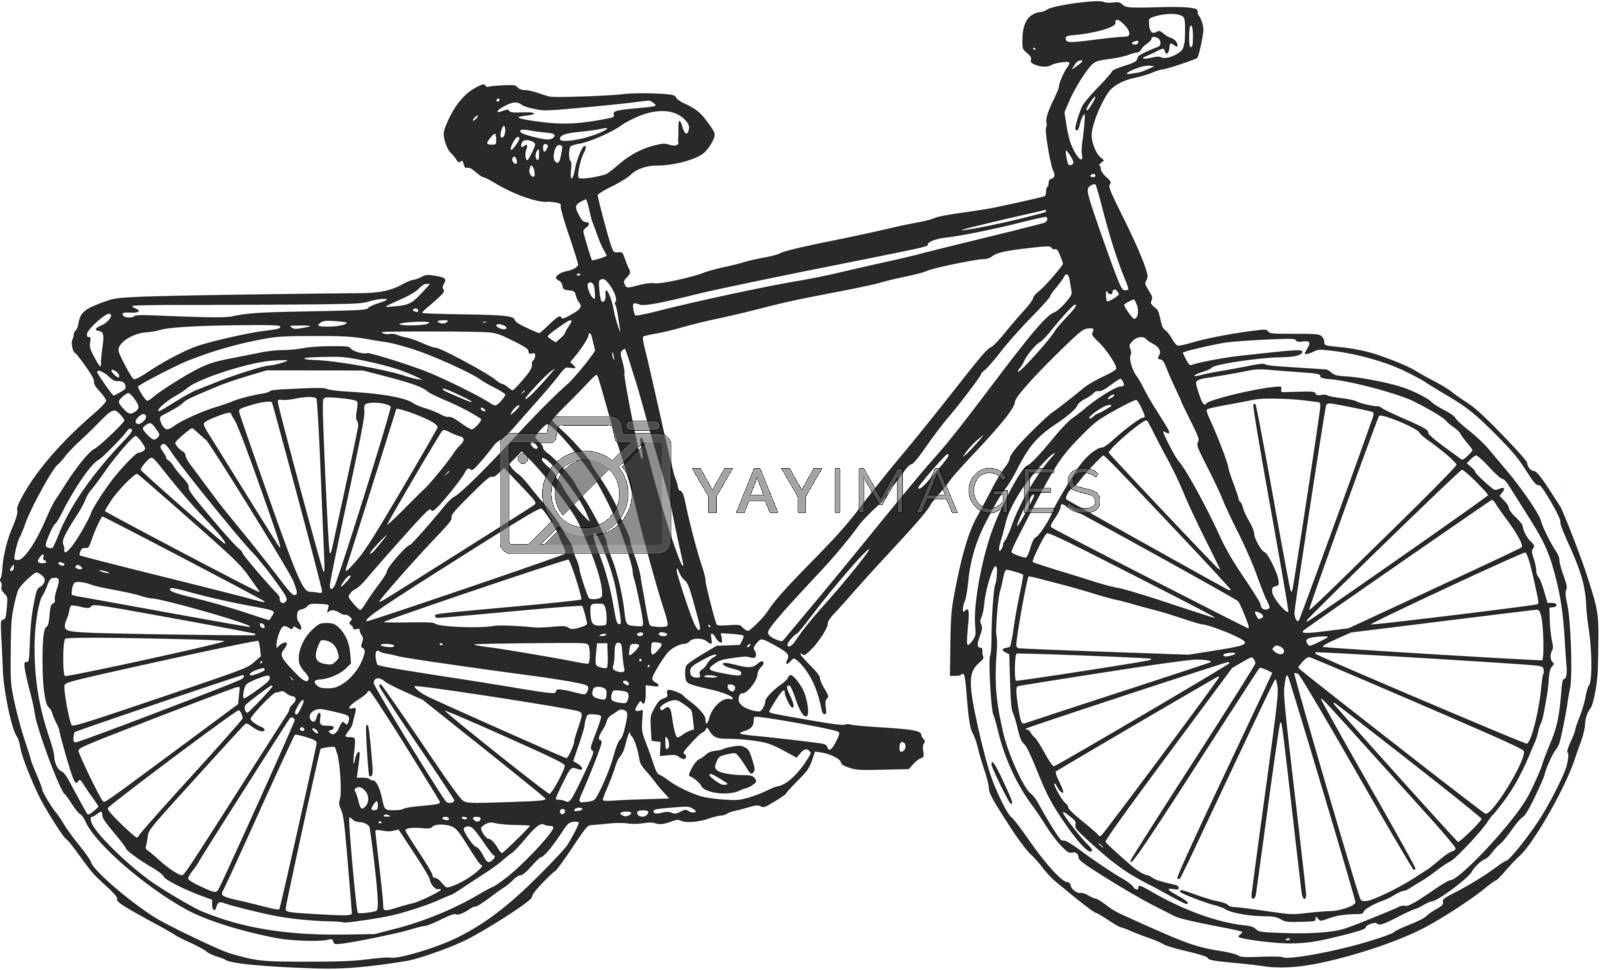 hand drawn, sketch, cartoon illustration of bicycle